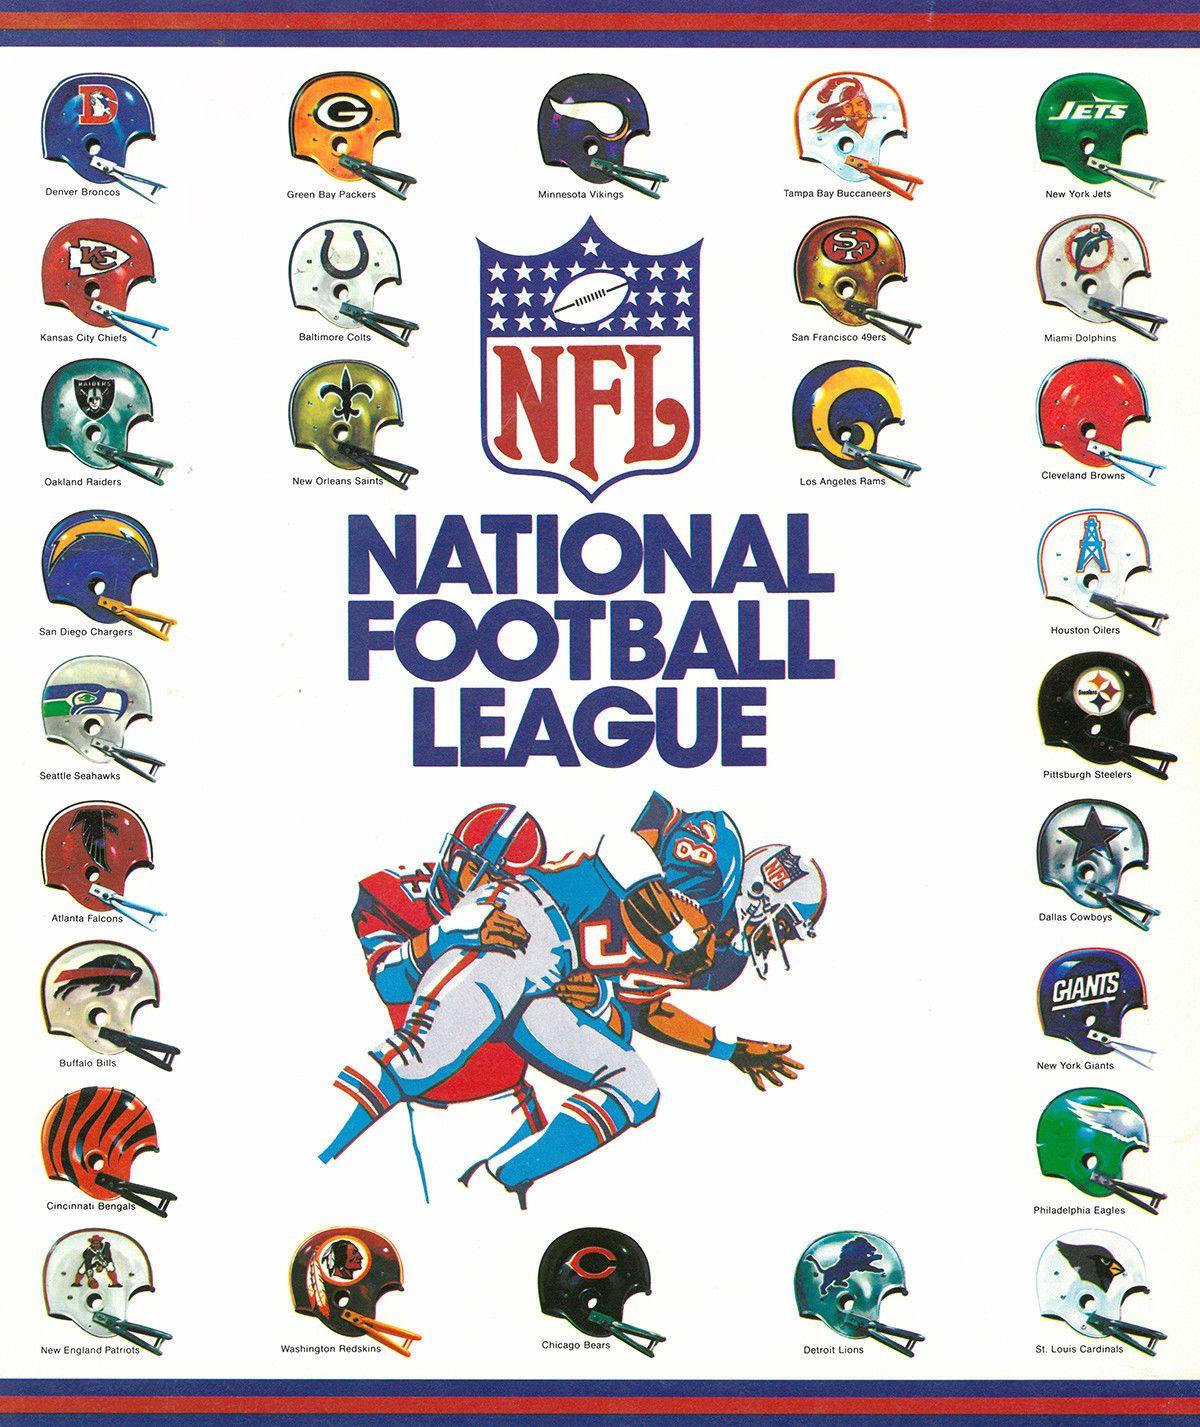 Throwback Vintage Nfl Helmets Mini Poster Print Very Cool Ebay Nfl Football Logos Nfl Football Helmets Nfl Football Art